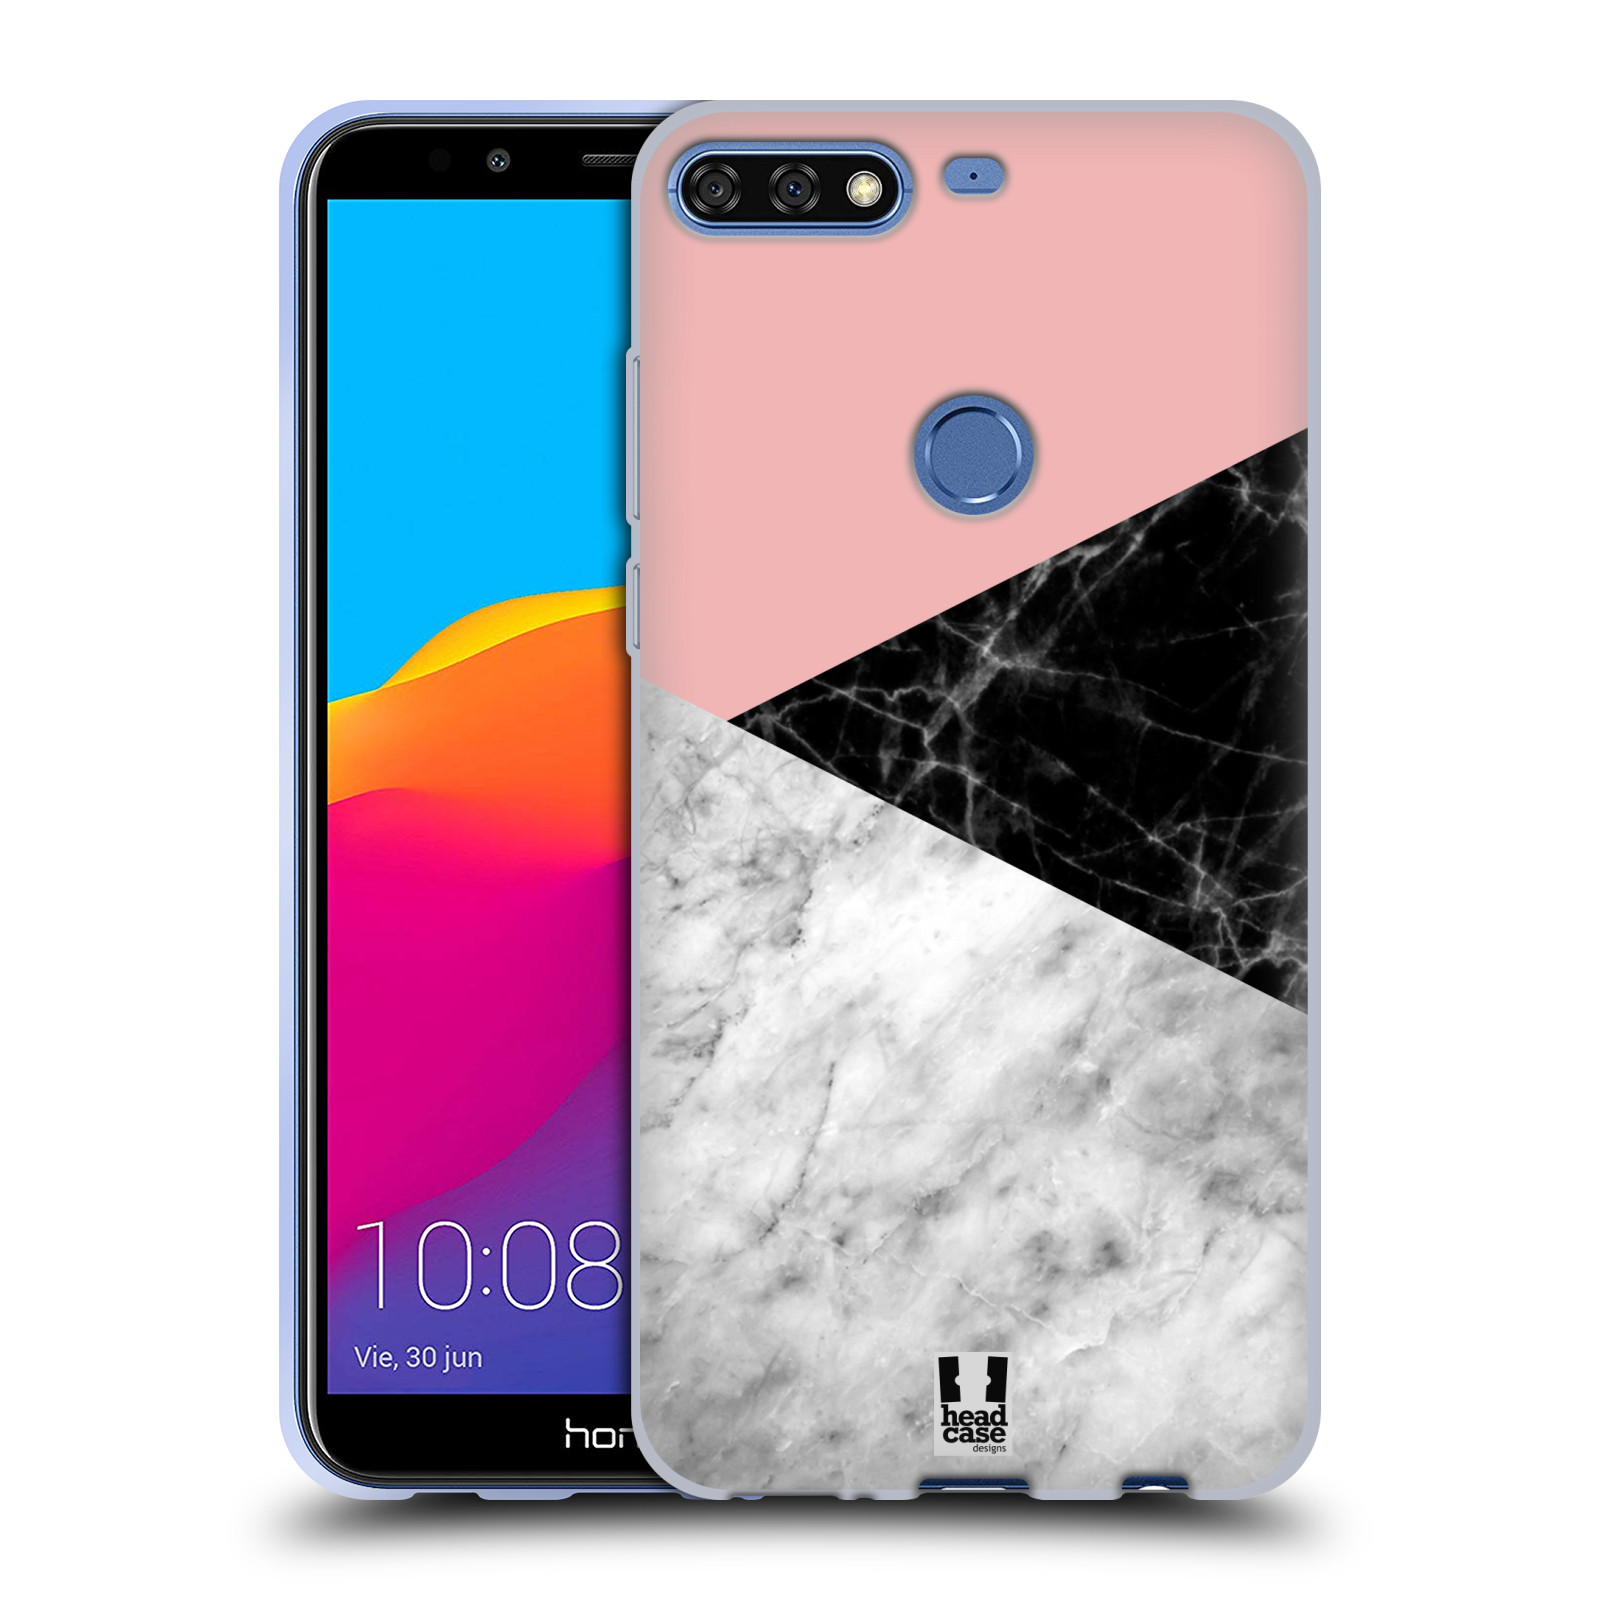 Silikonové pouzdro na mobil Huawei Y7 Prime (2018) - Head Case - Mramor mix